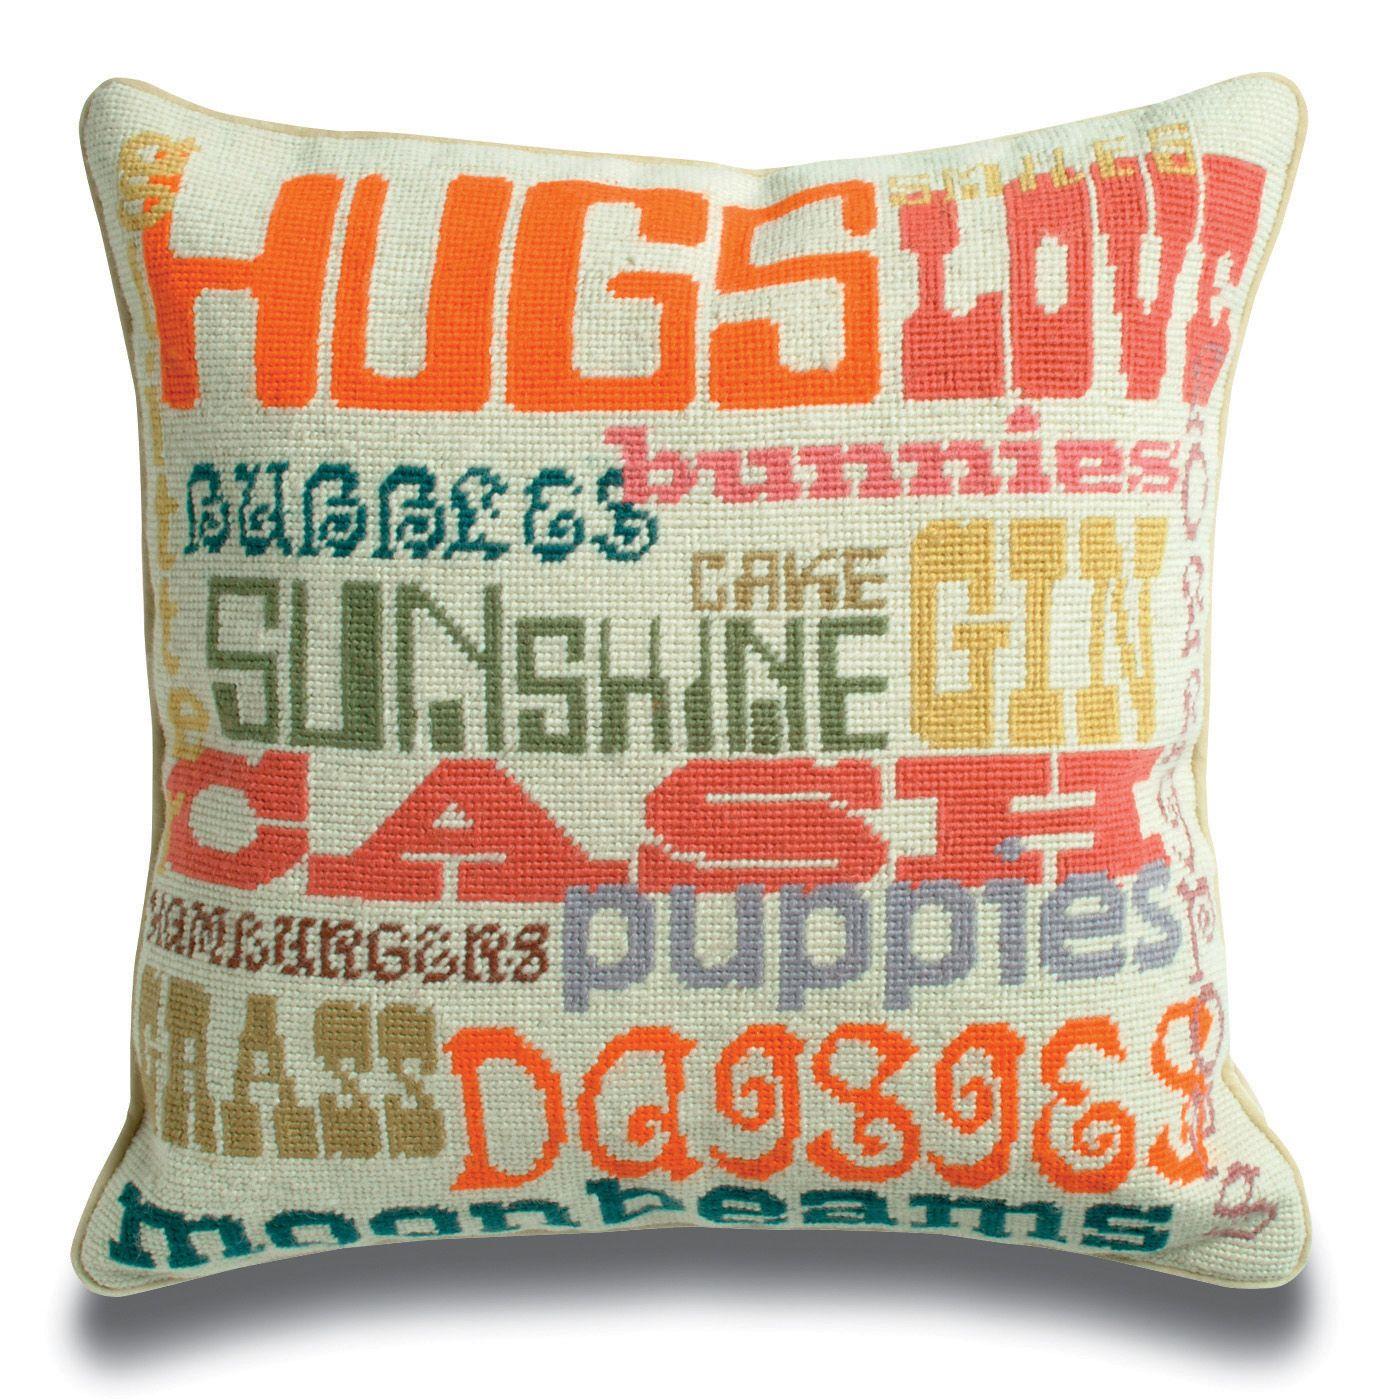 Jonathan Adler Happy Pillow Etsy Jonathanadler Getchicsweepstakes Needlepoint Pillows Throw Pillows Hug Pillow